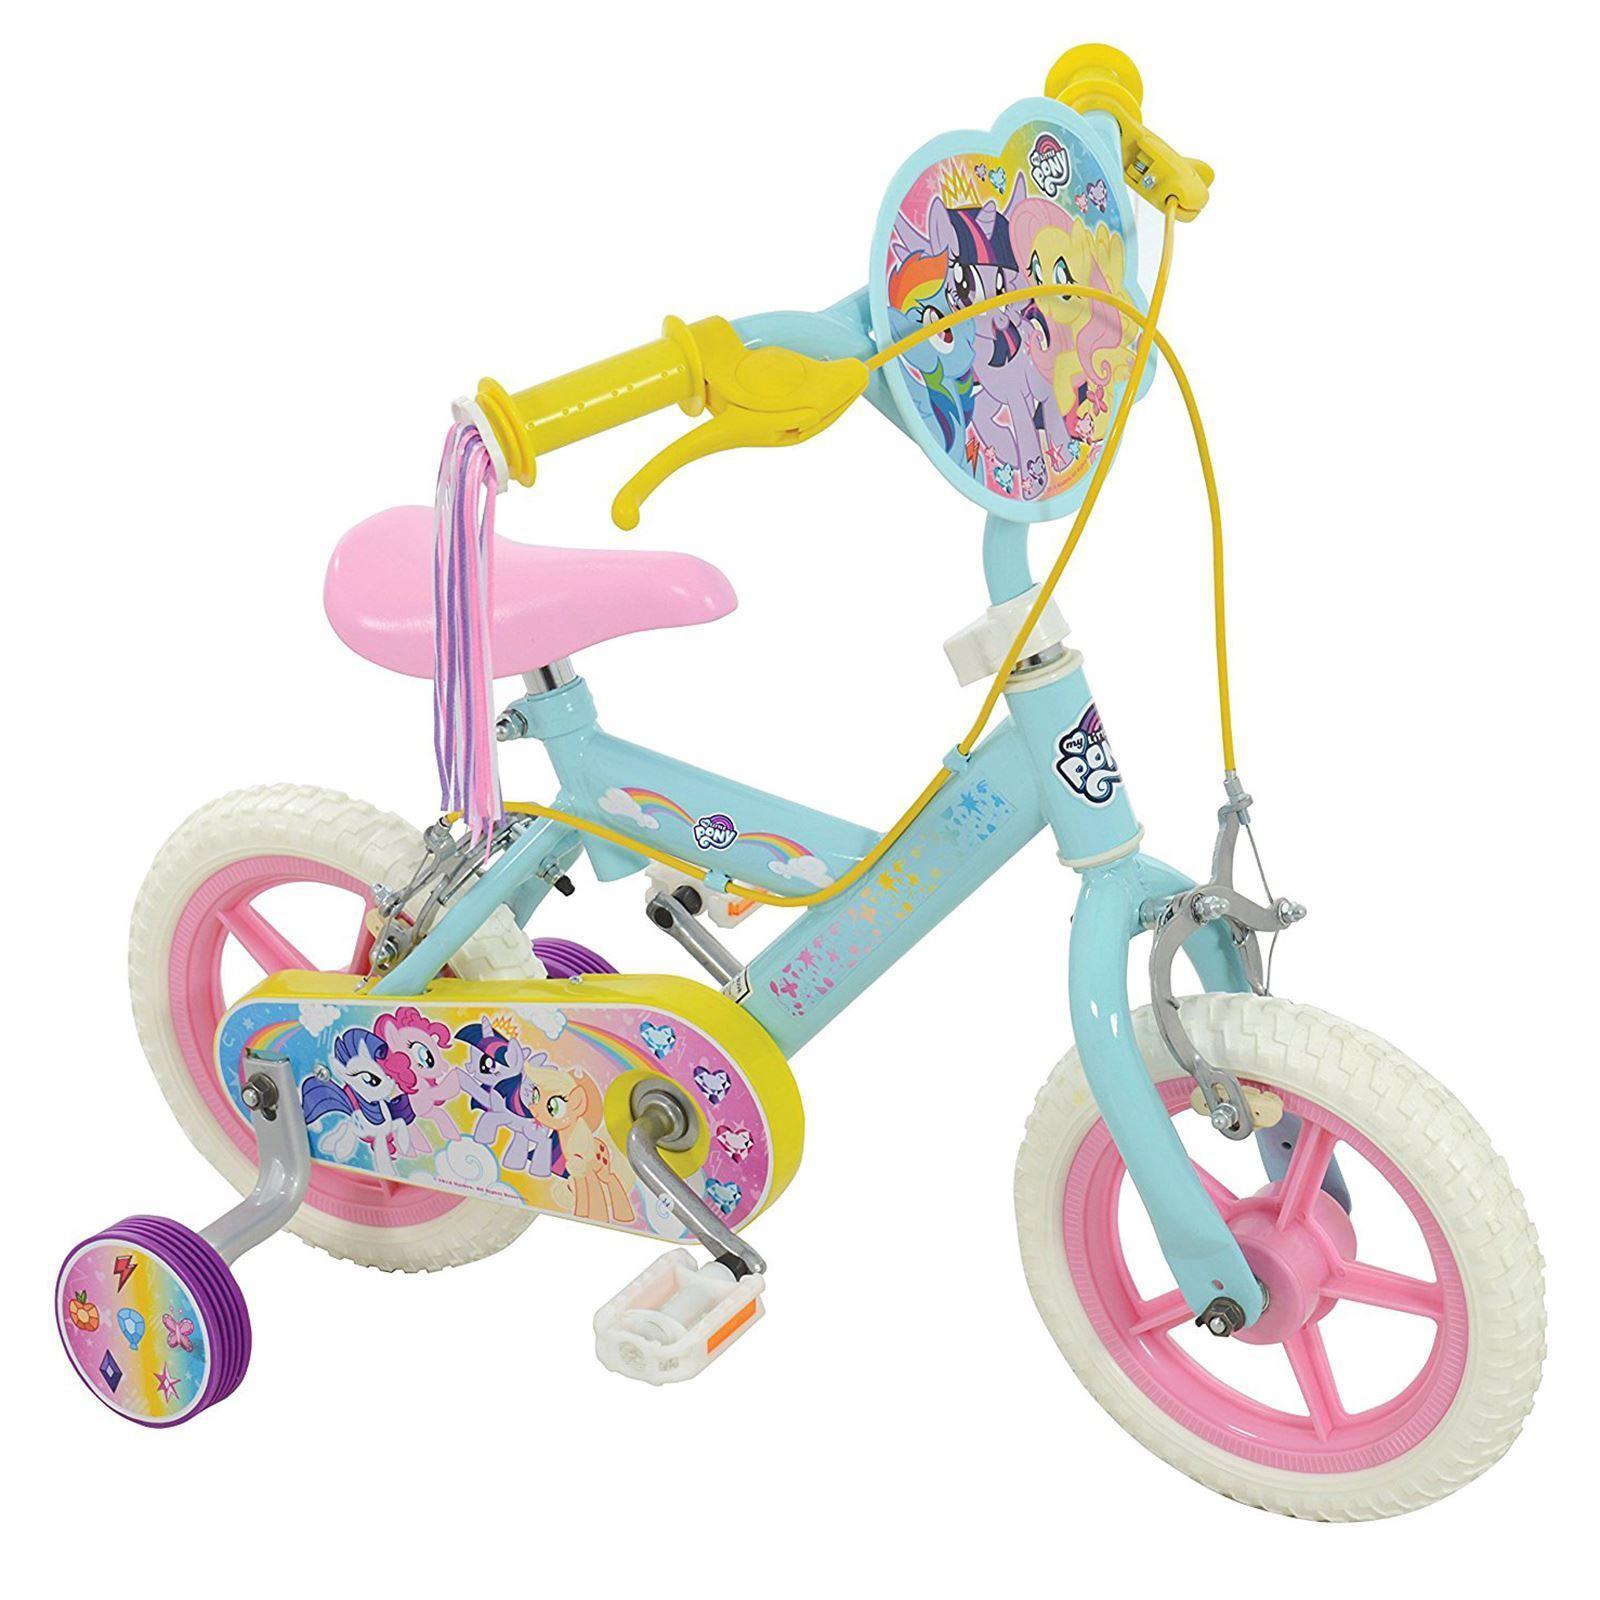 My Little Pony 12  Bicicleta 2 en 1 Manillar Cintas Altura Ajustable Niño Niña